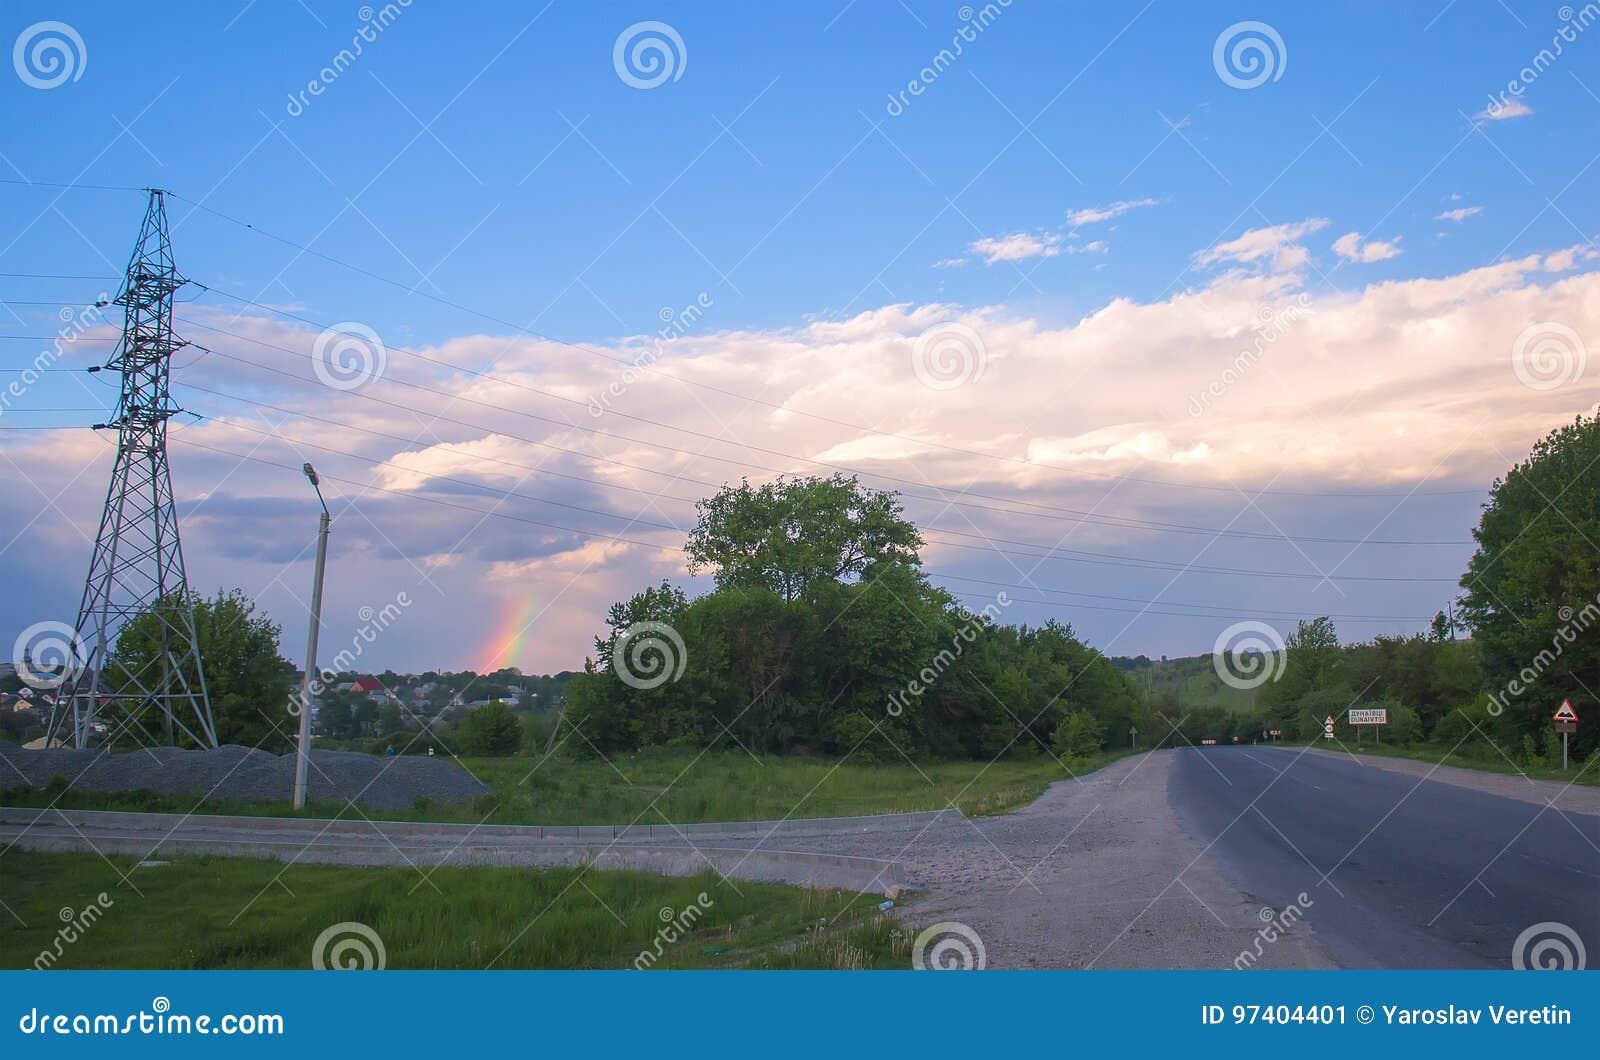 шоссе в осени с радугой